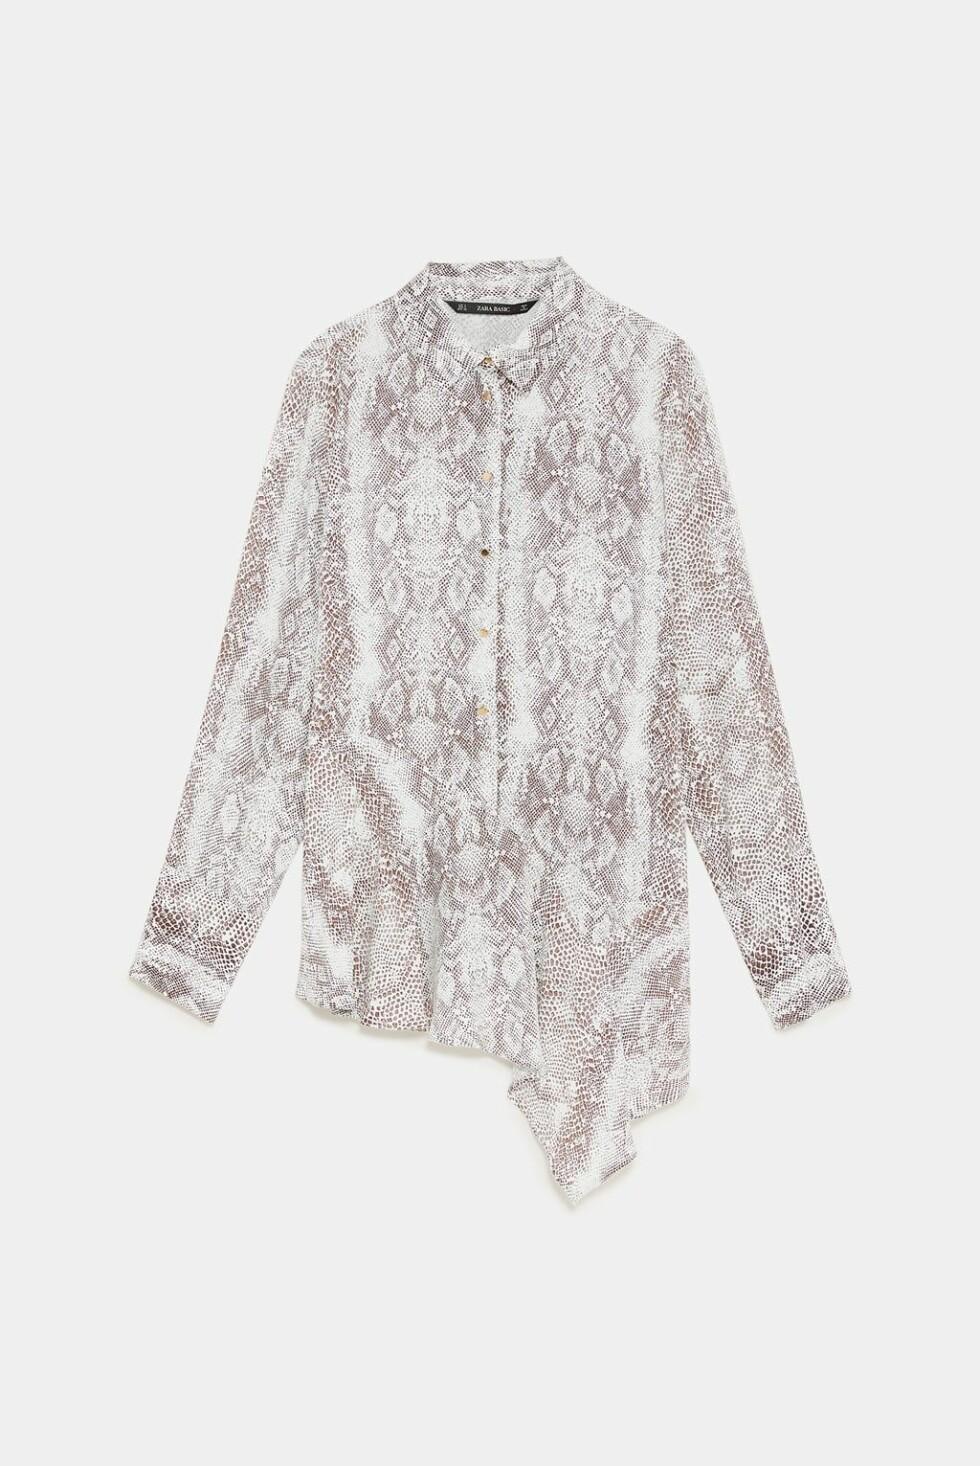 Skjorte fra Zara |350,-| https://www.zara.com/no/no/asymmetrisk-skjorte-med-dyrem%C3%B8nster-p09878168.html?v1=7386610&v2=1074660